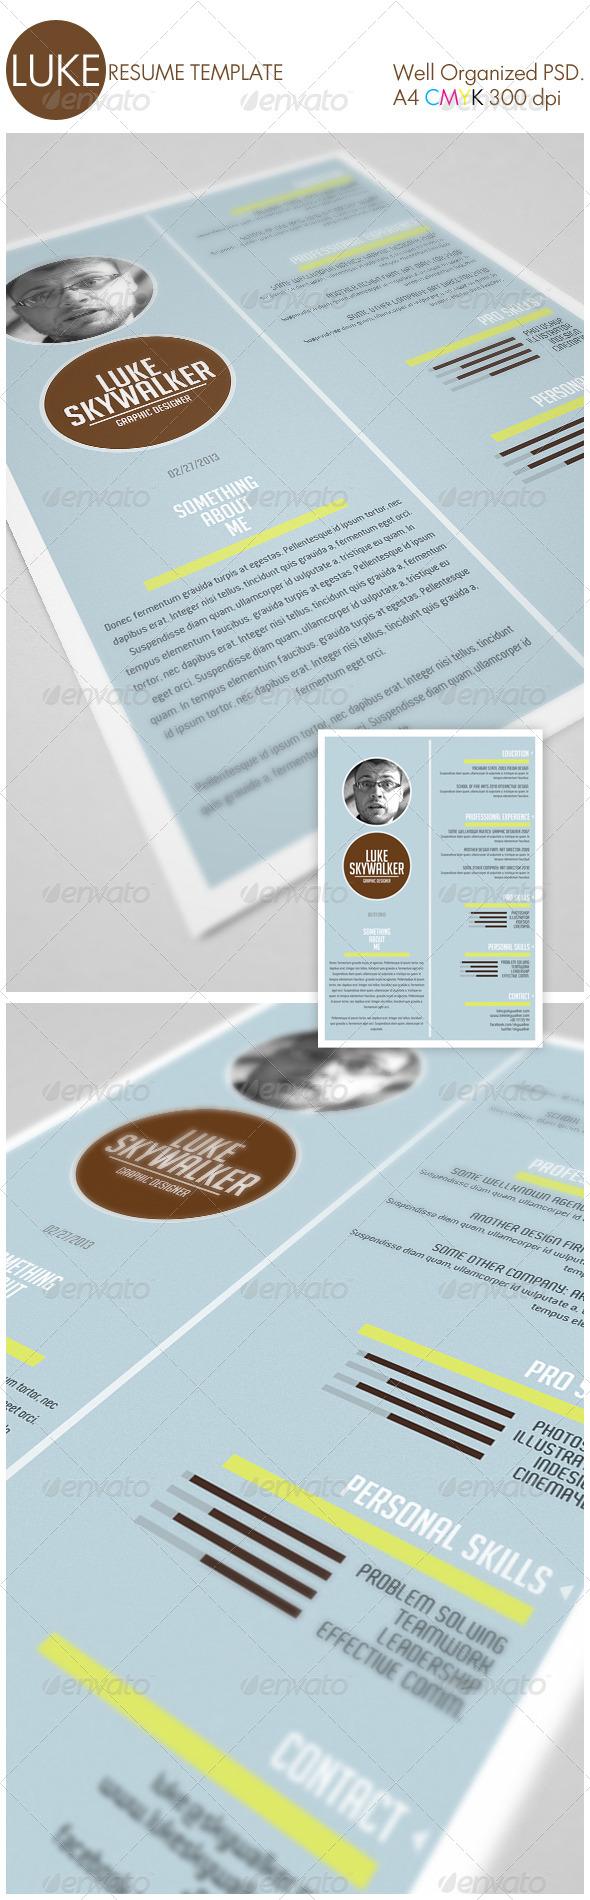 GraphicRiver Luke Resume Template 4155560